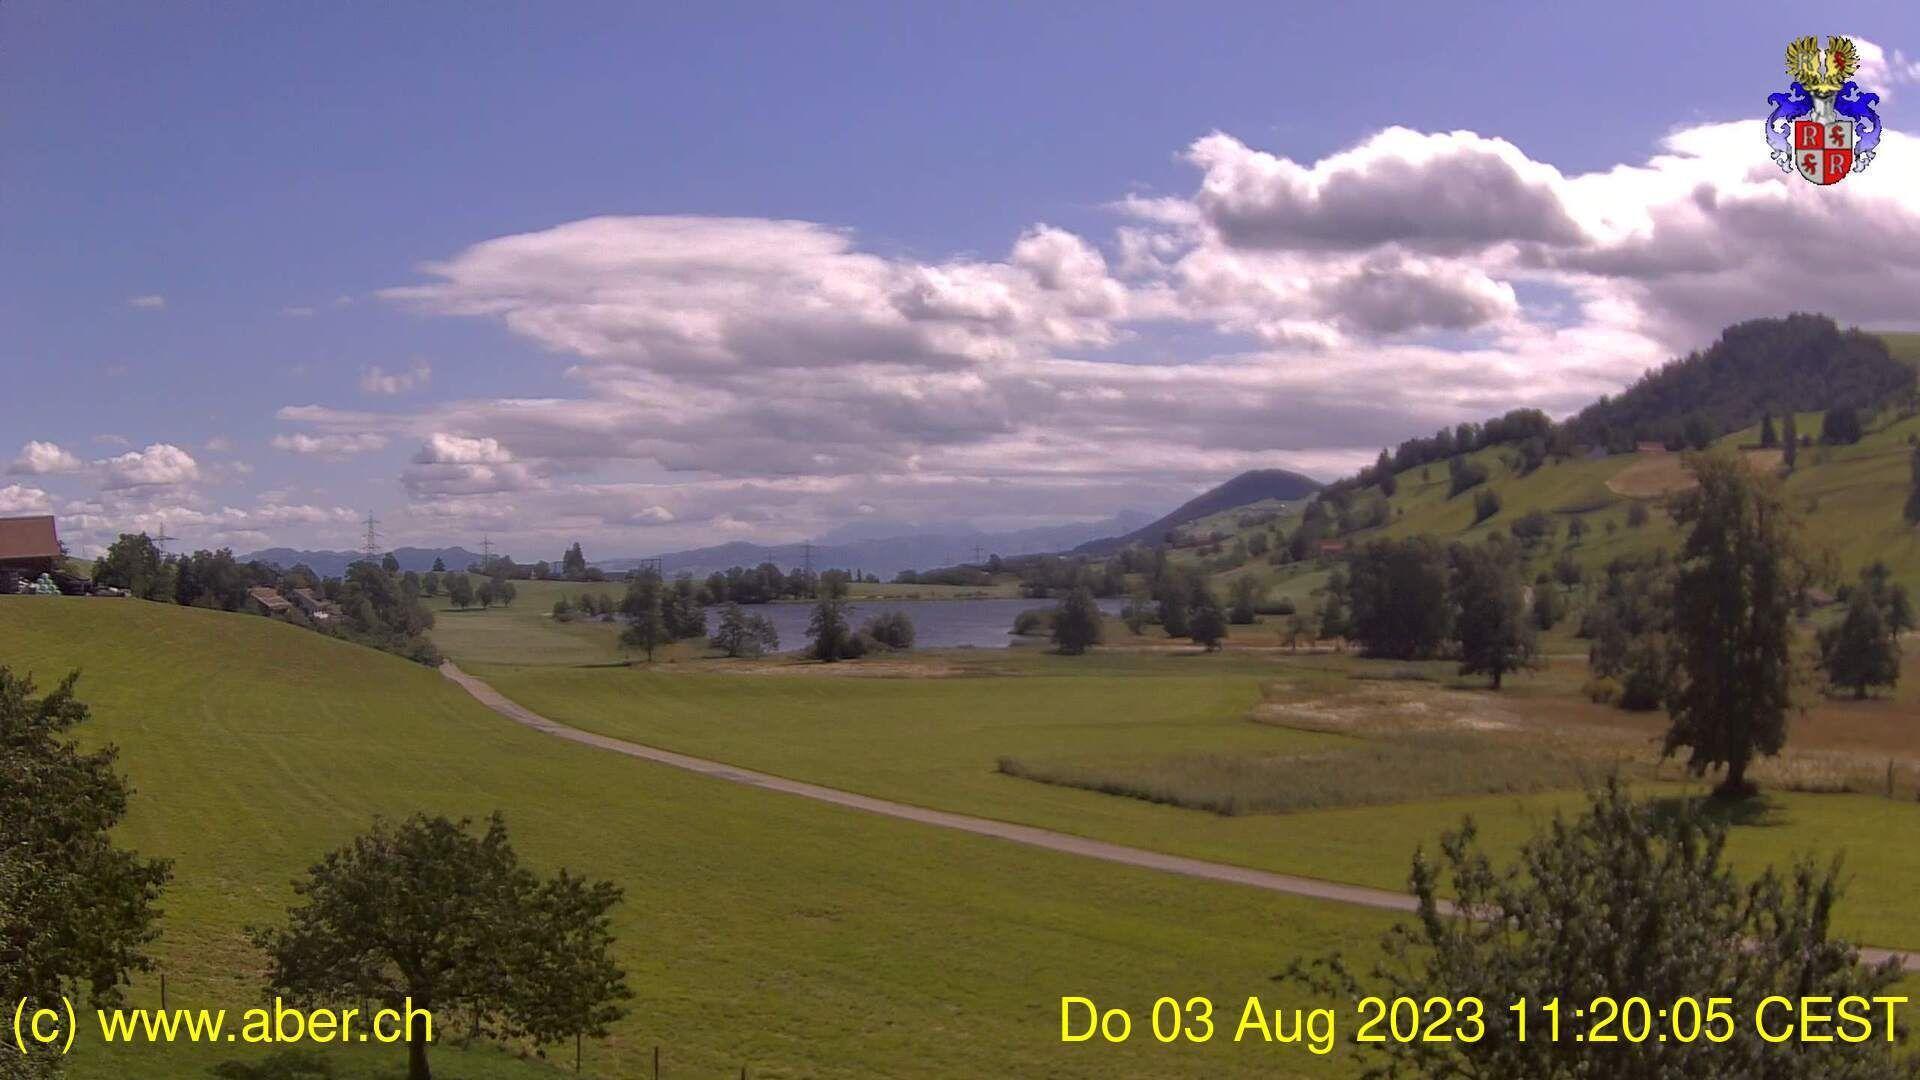 Johannisburg: Hüttnersee